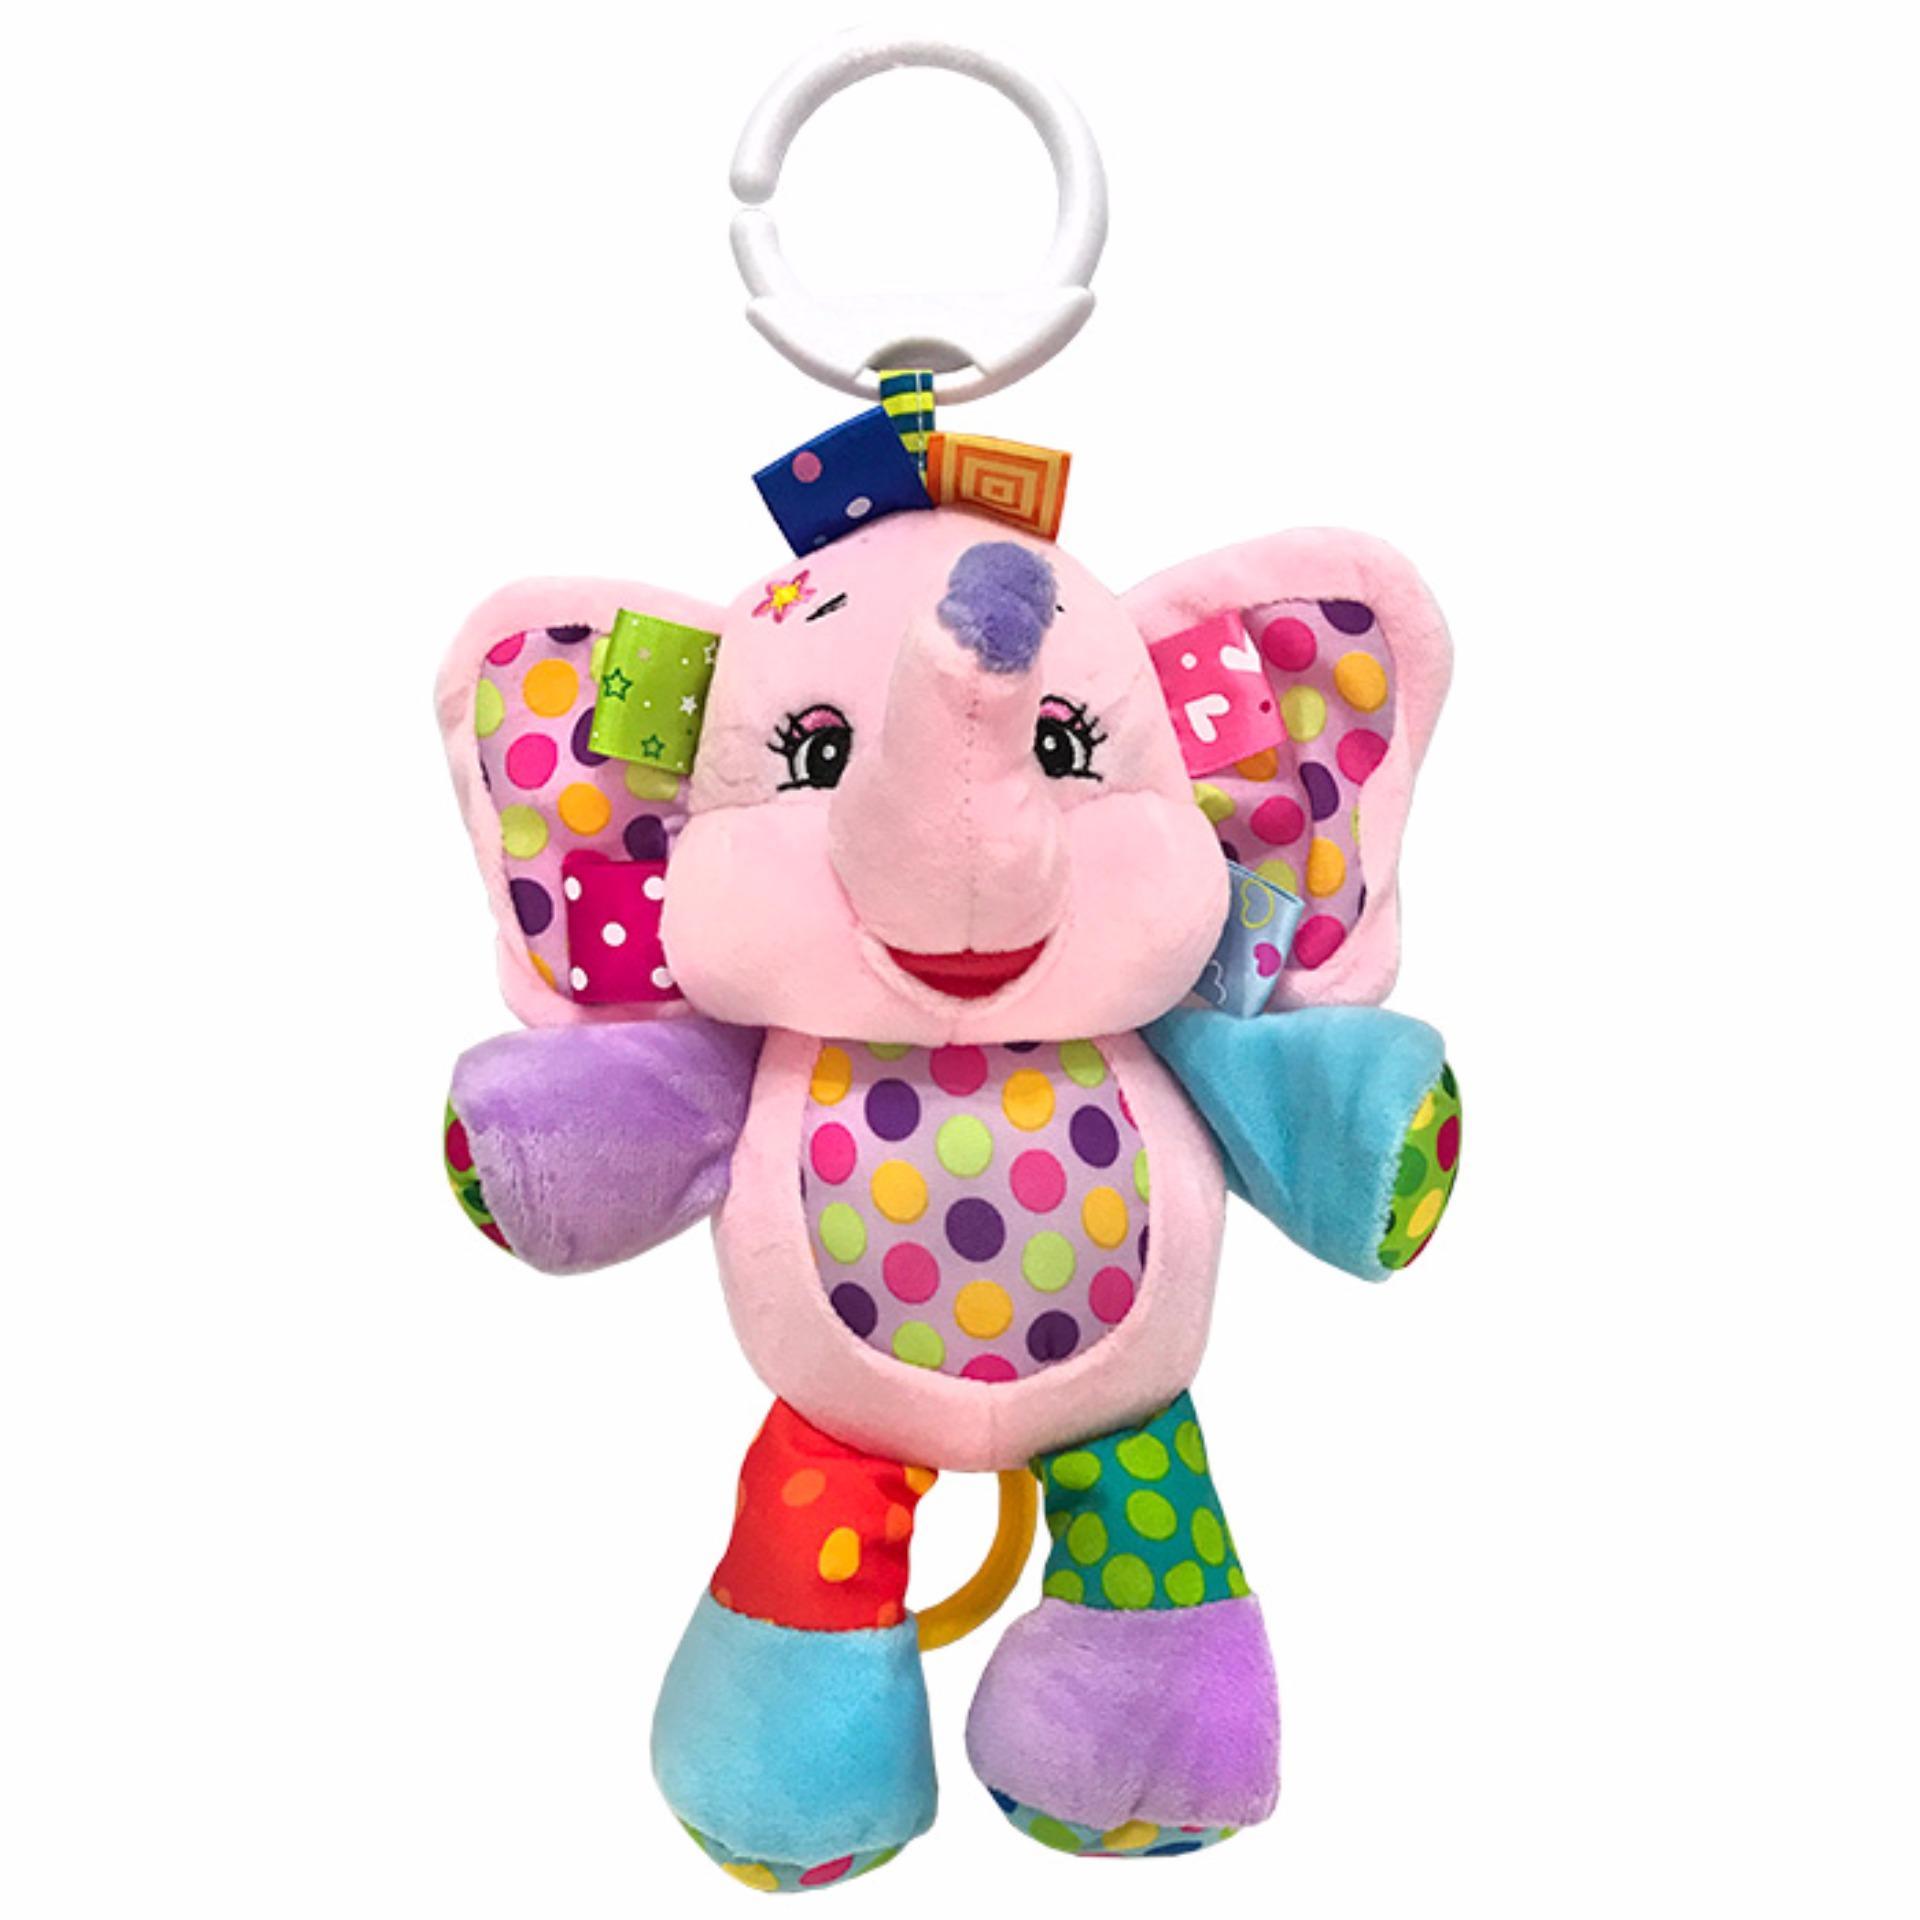 Jolly Baby Mainan Boneka Musik - Pink Elephant